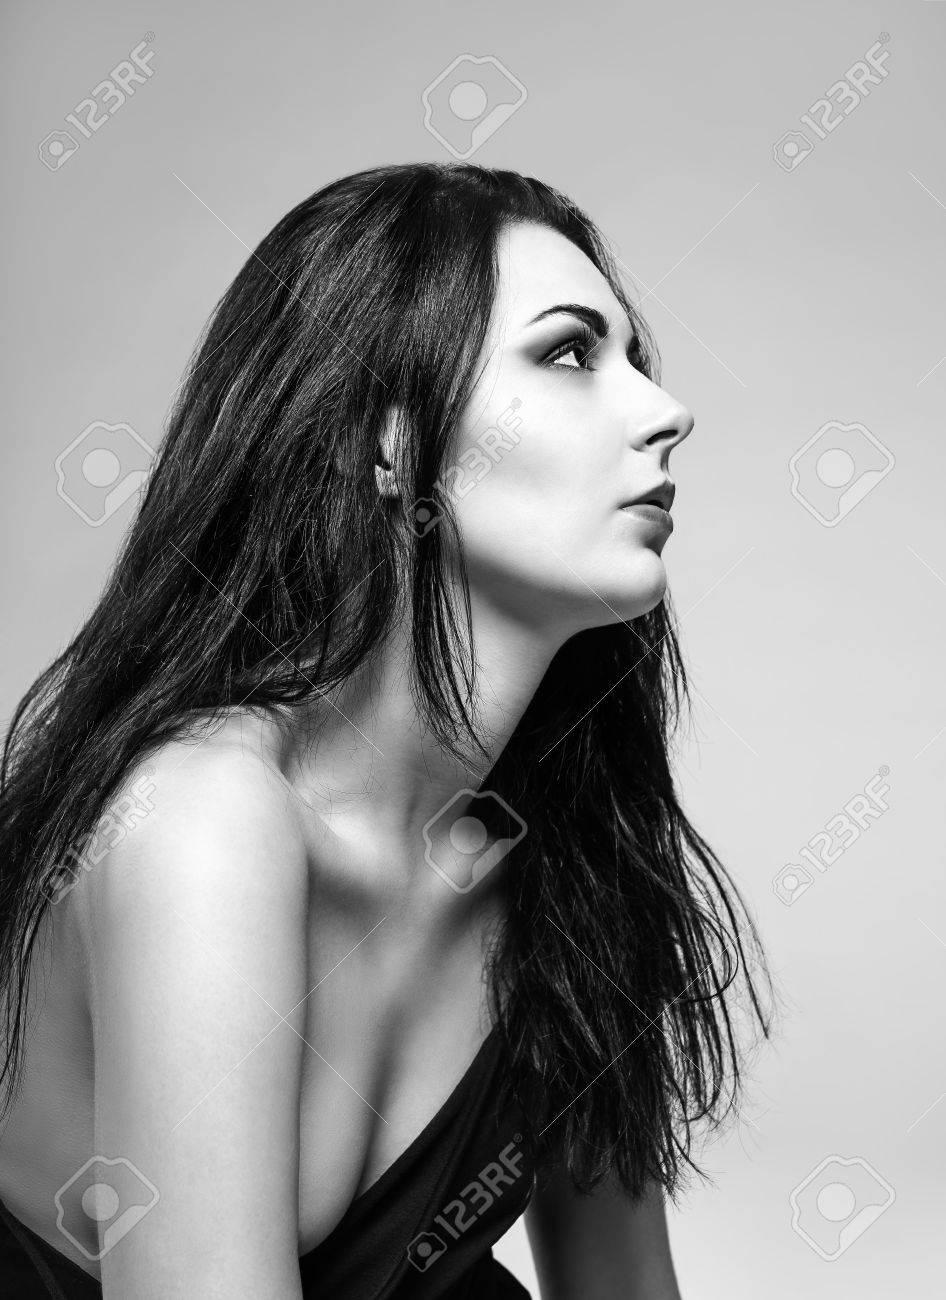 Stock photo studio portrait of a beautiful girl profile view black and white photo